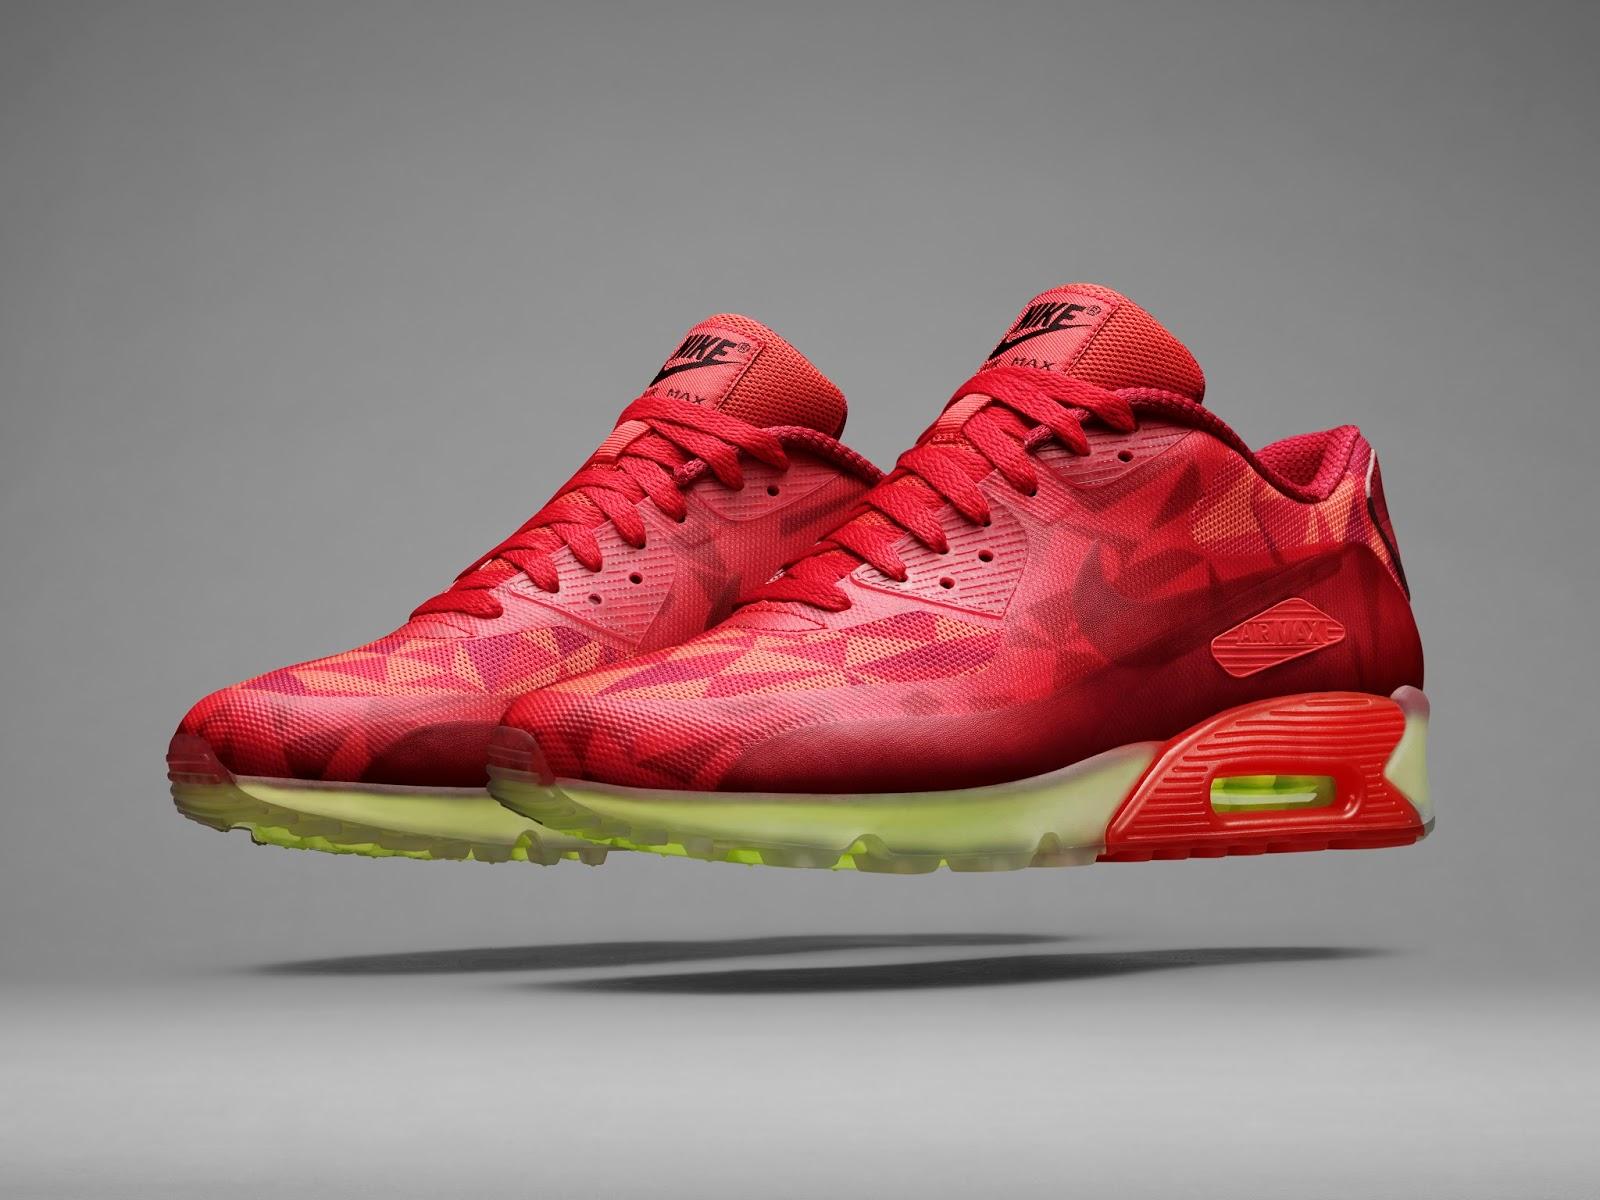 Nike Air Max 90 Créations De Glace Rouge